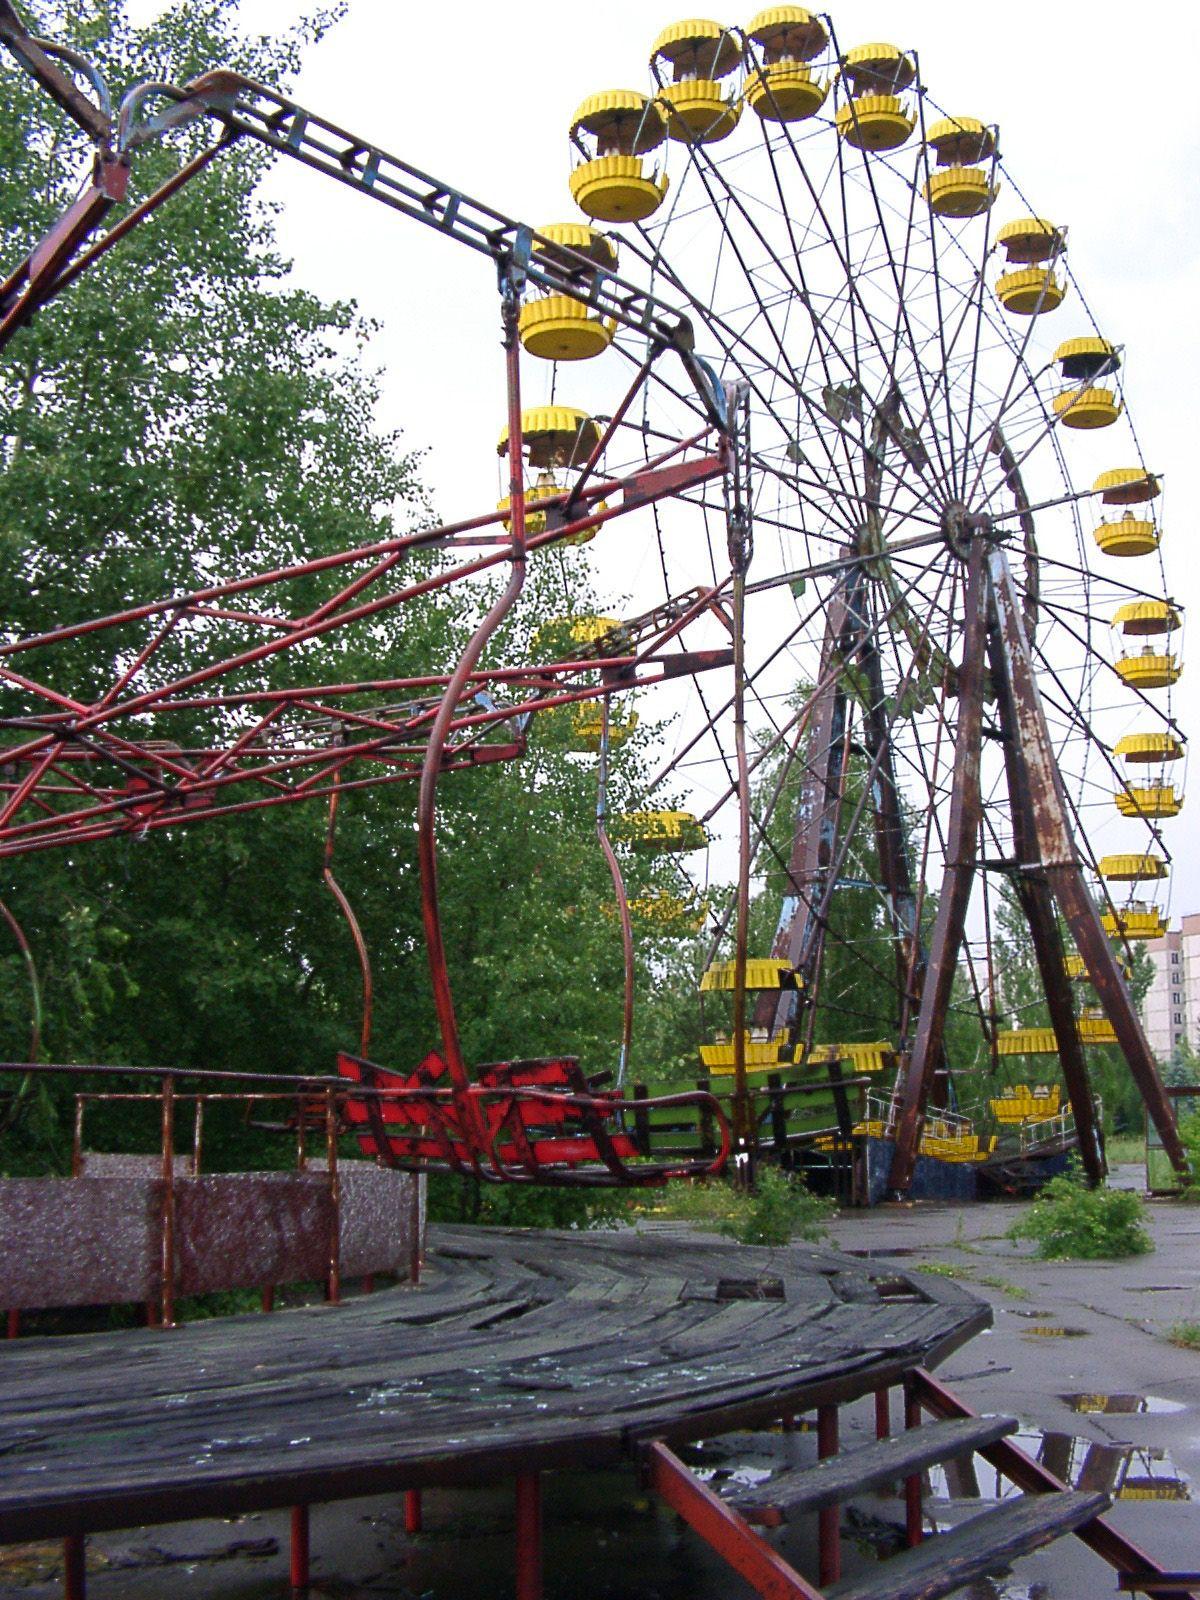 ferris wheel in former Soviet Union town Pripyat, a city